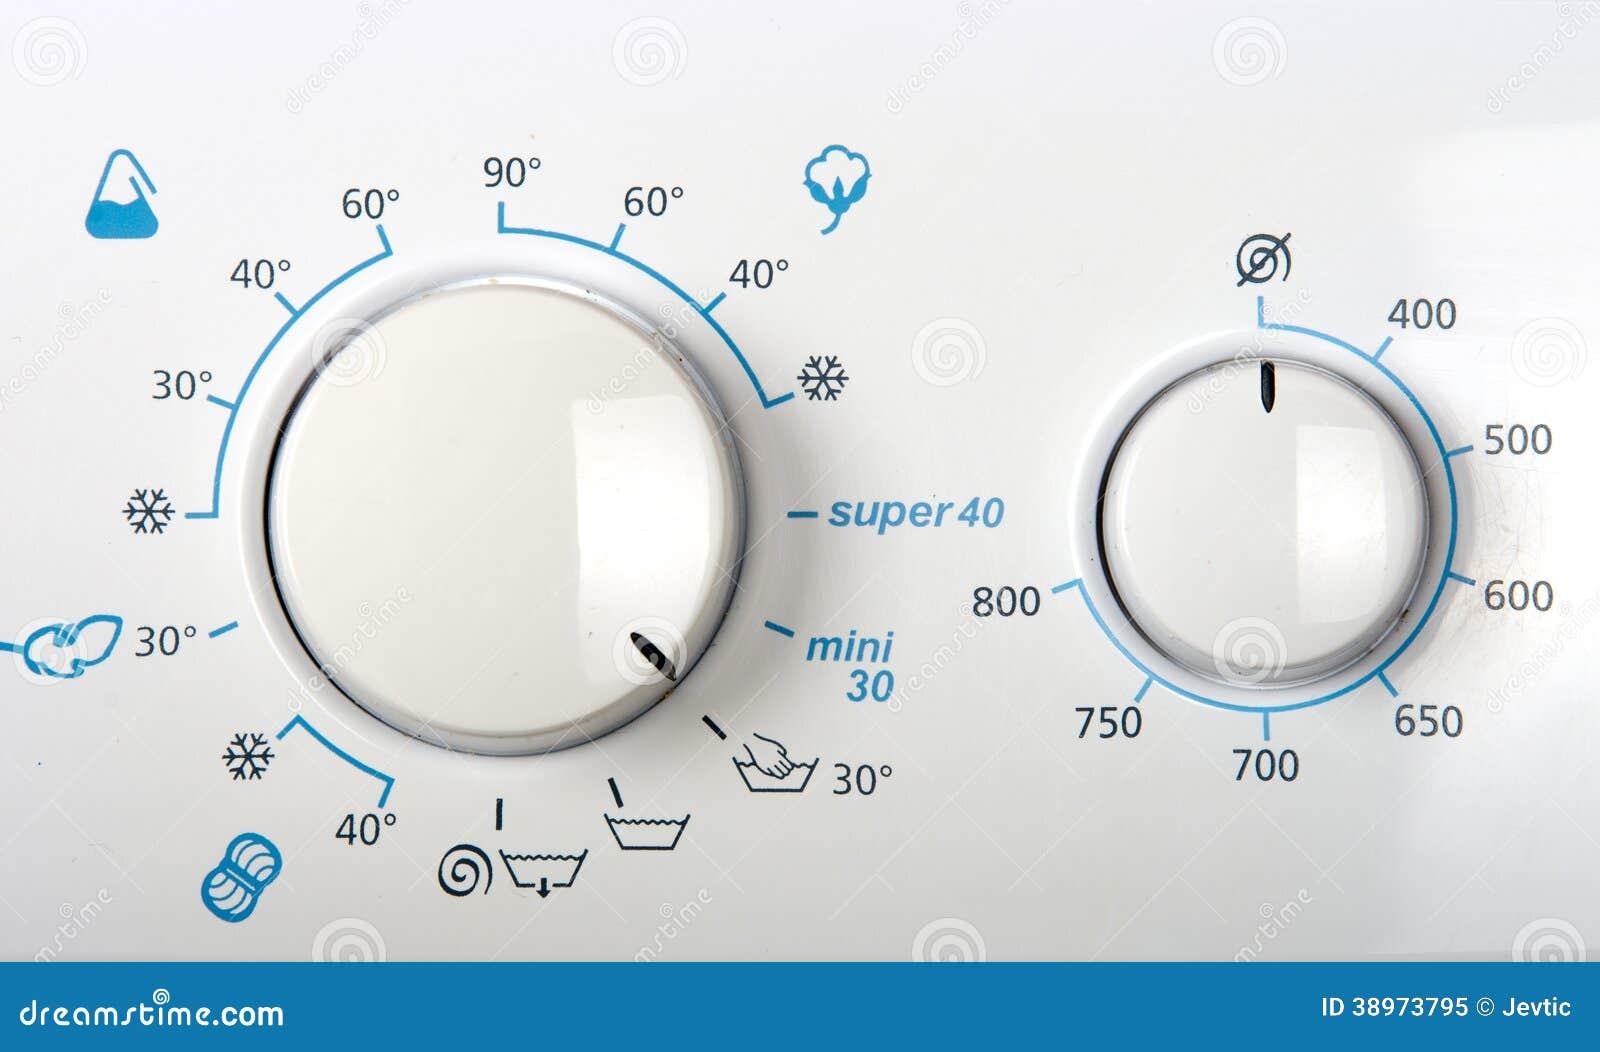 Washing Machine Controls : Washing machine control panel stock photo image